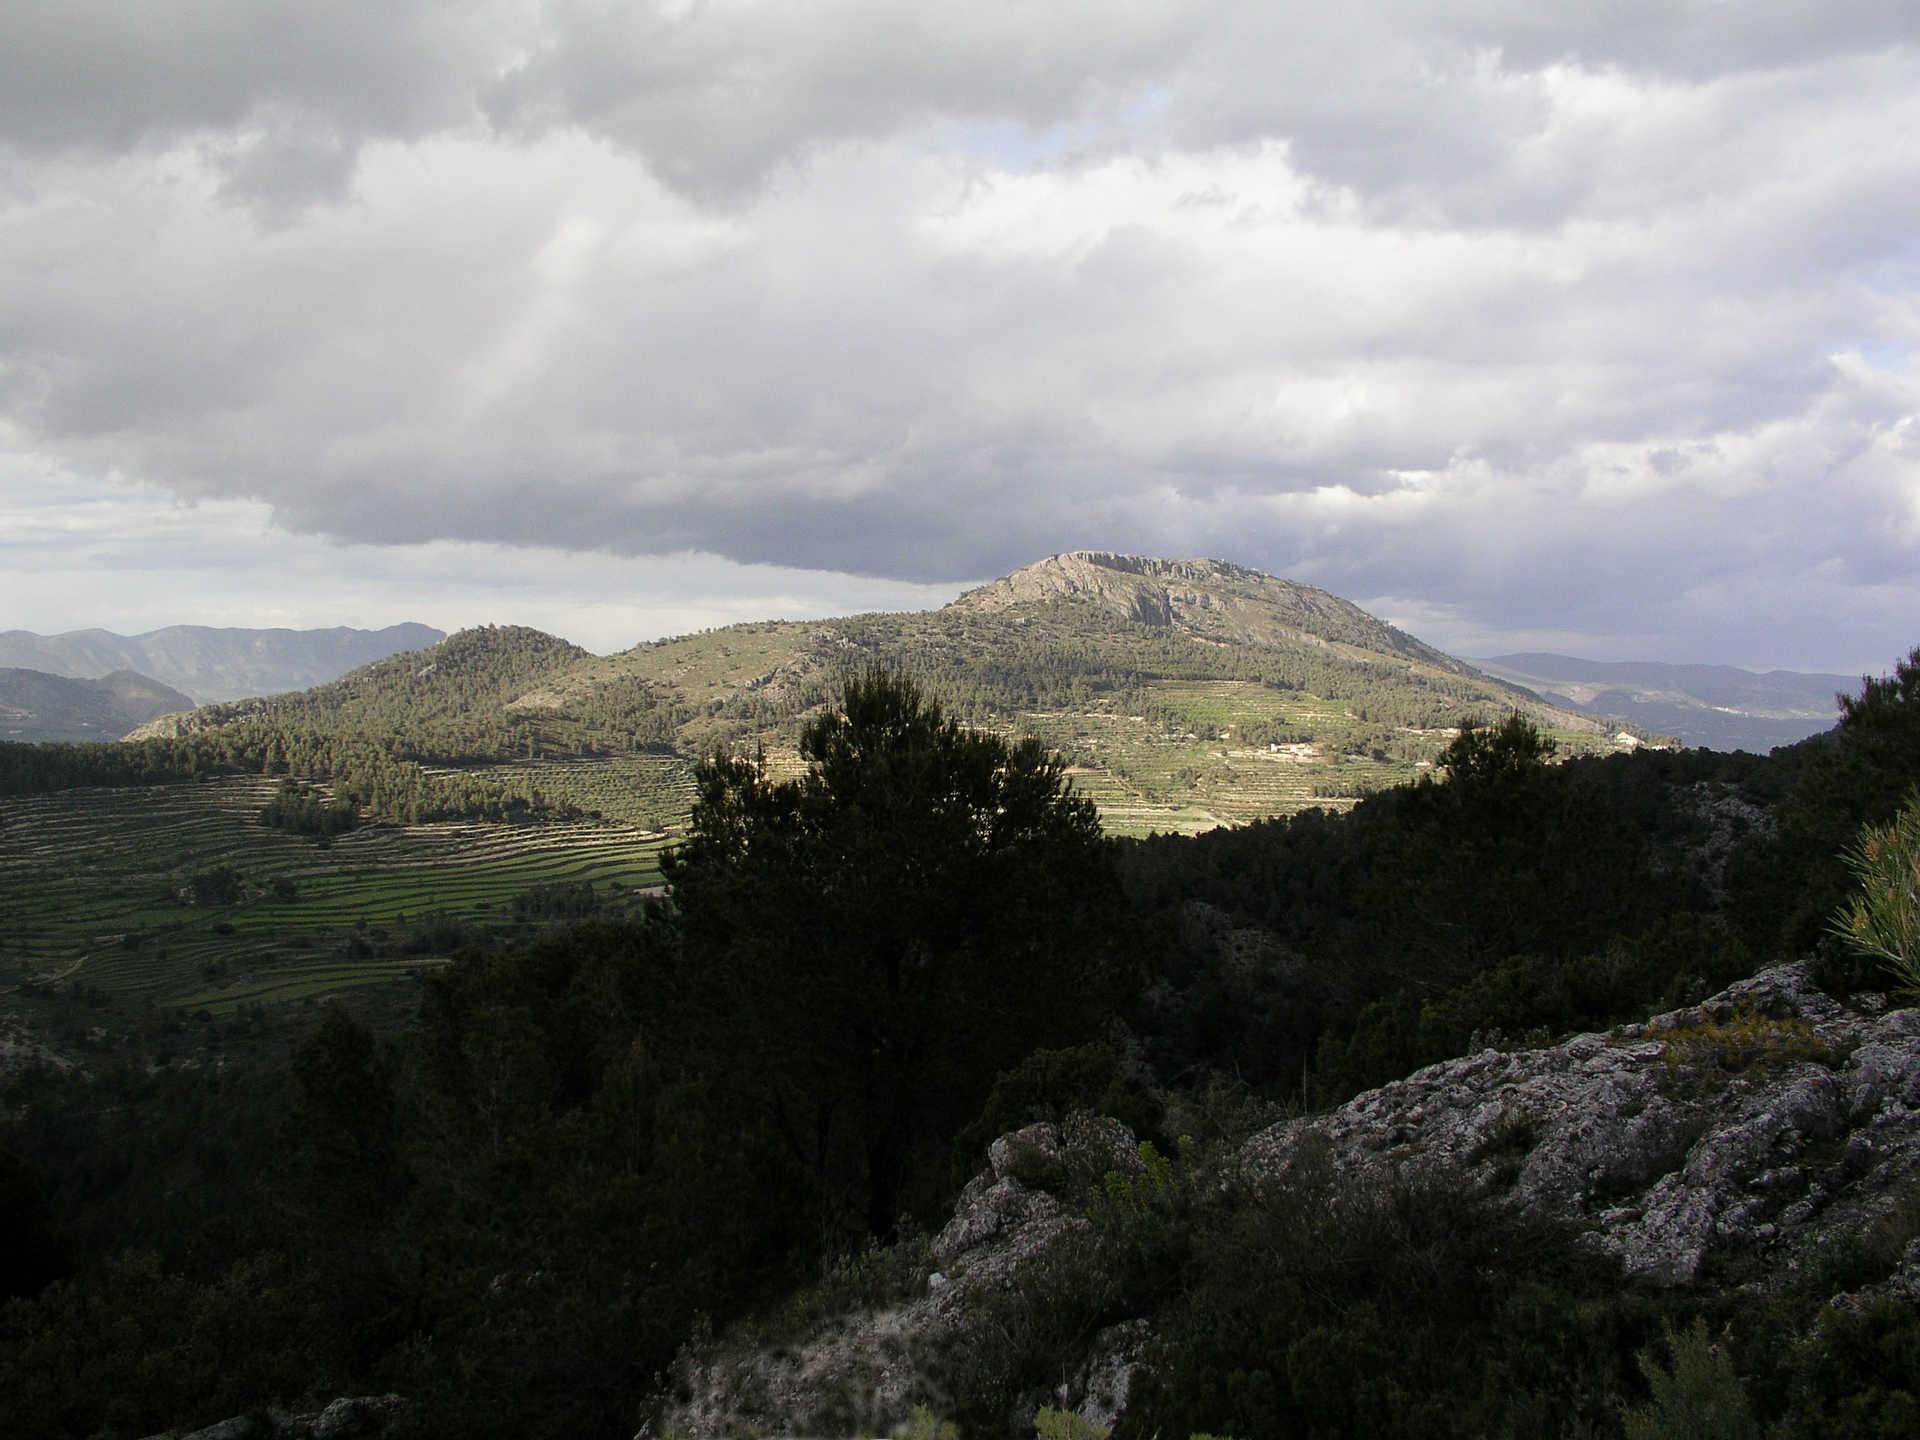 Ruinas Arqueológicas La Serreta